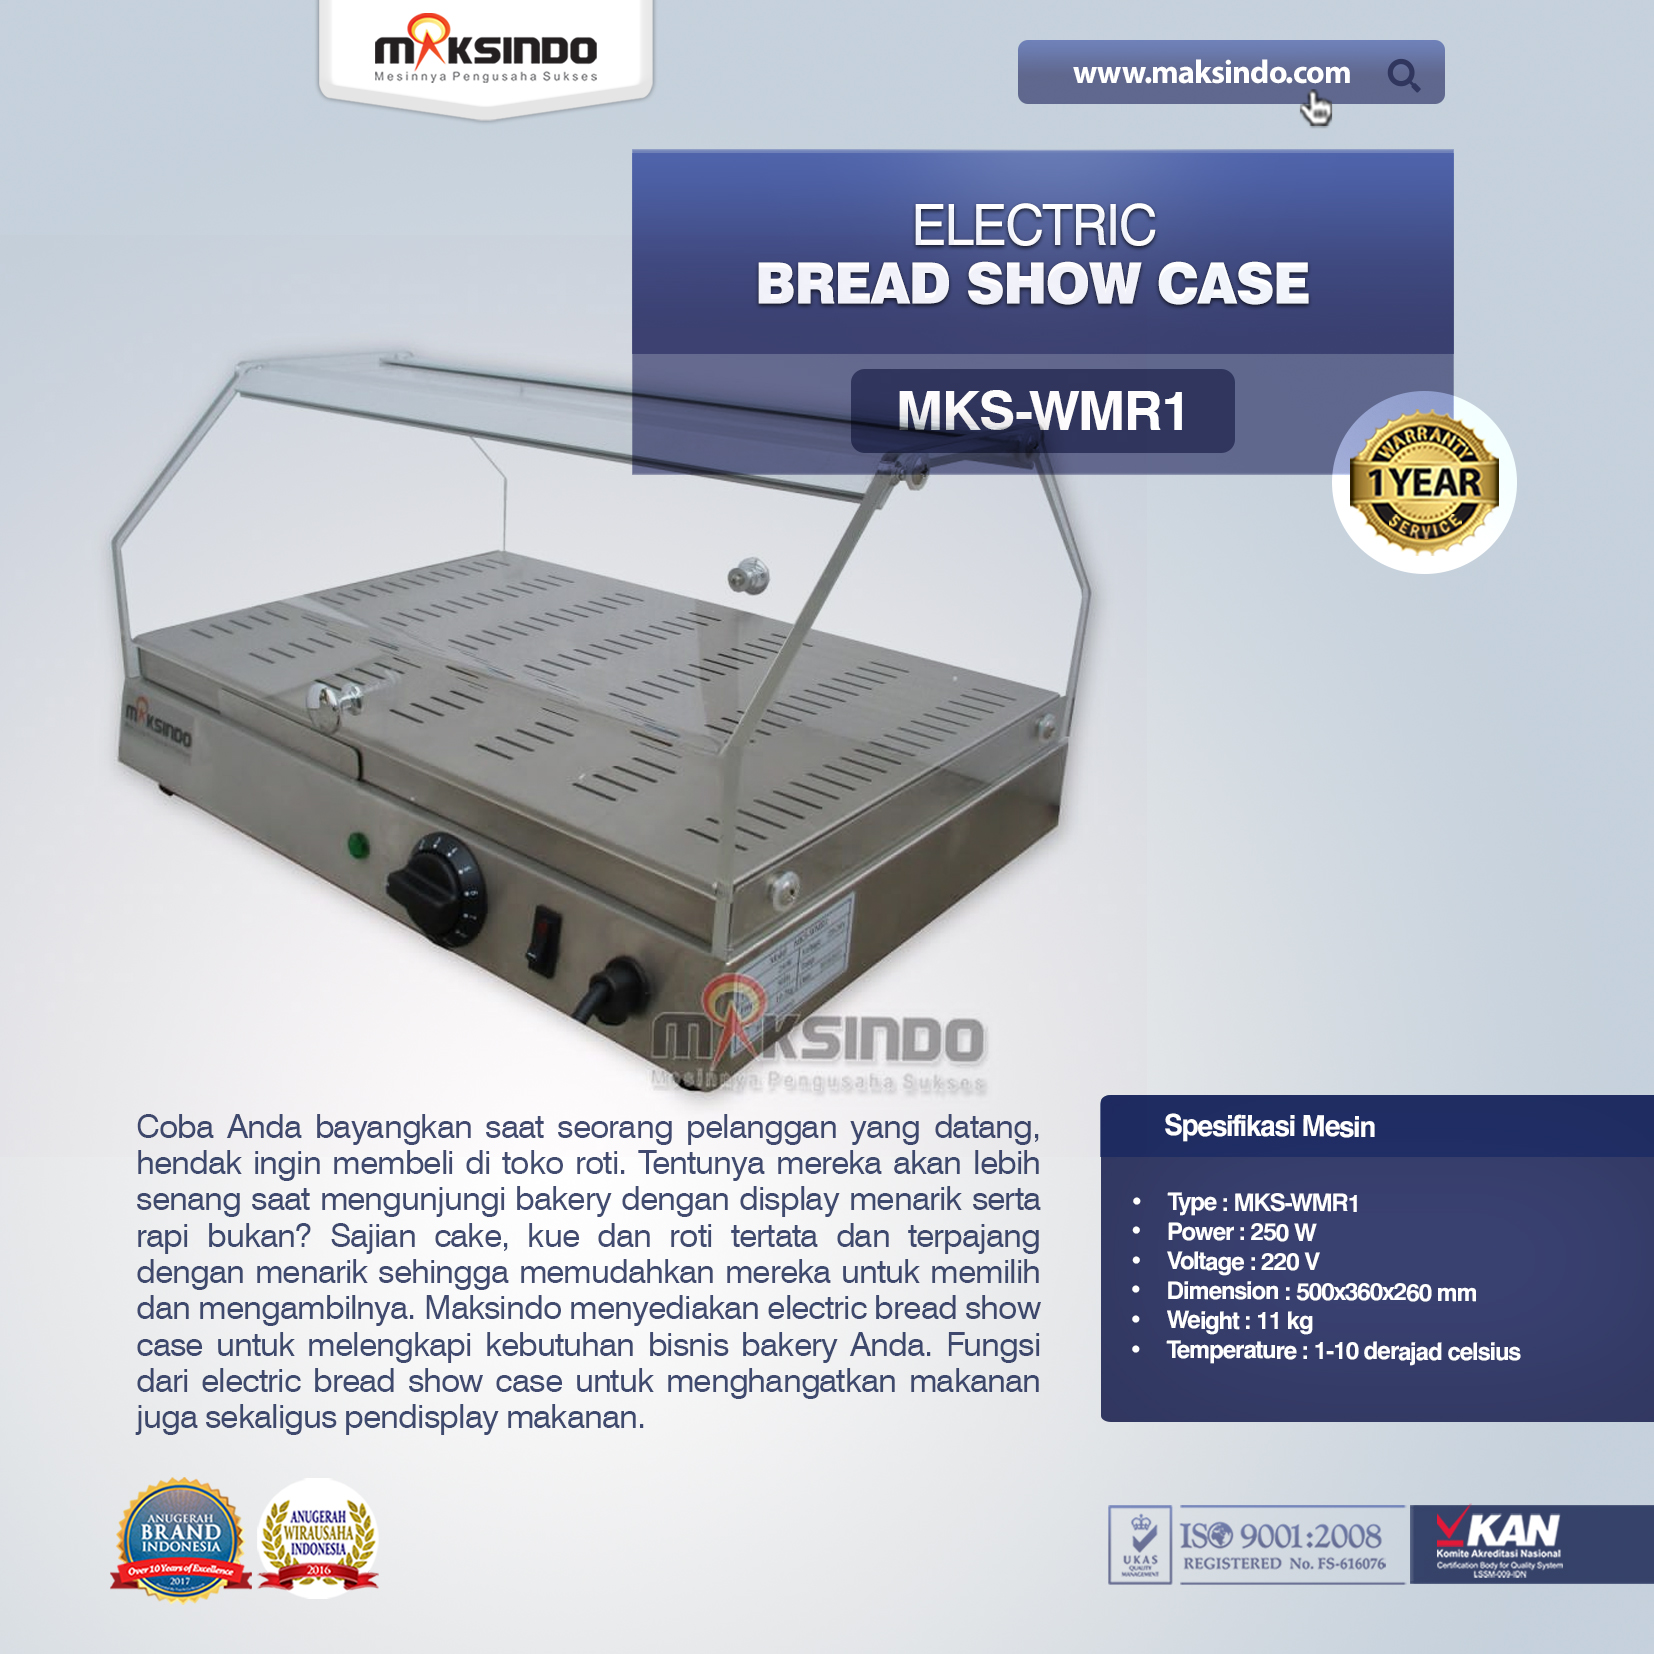 Jual Electric Bread Show Case MKS-WMR1 di Tangerang